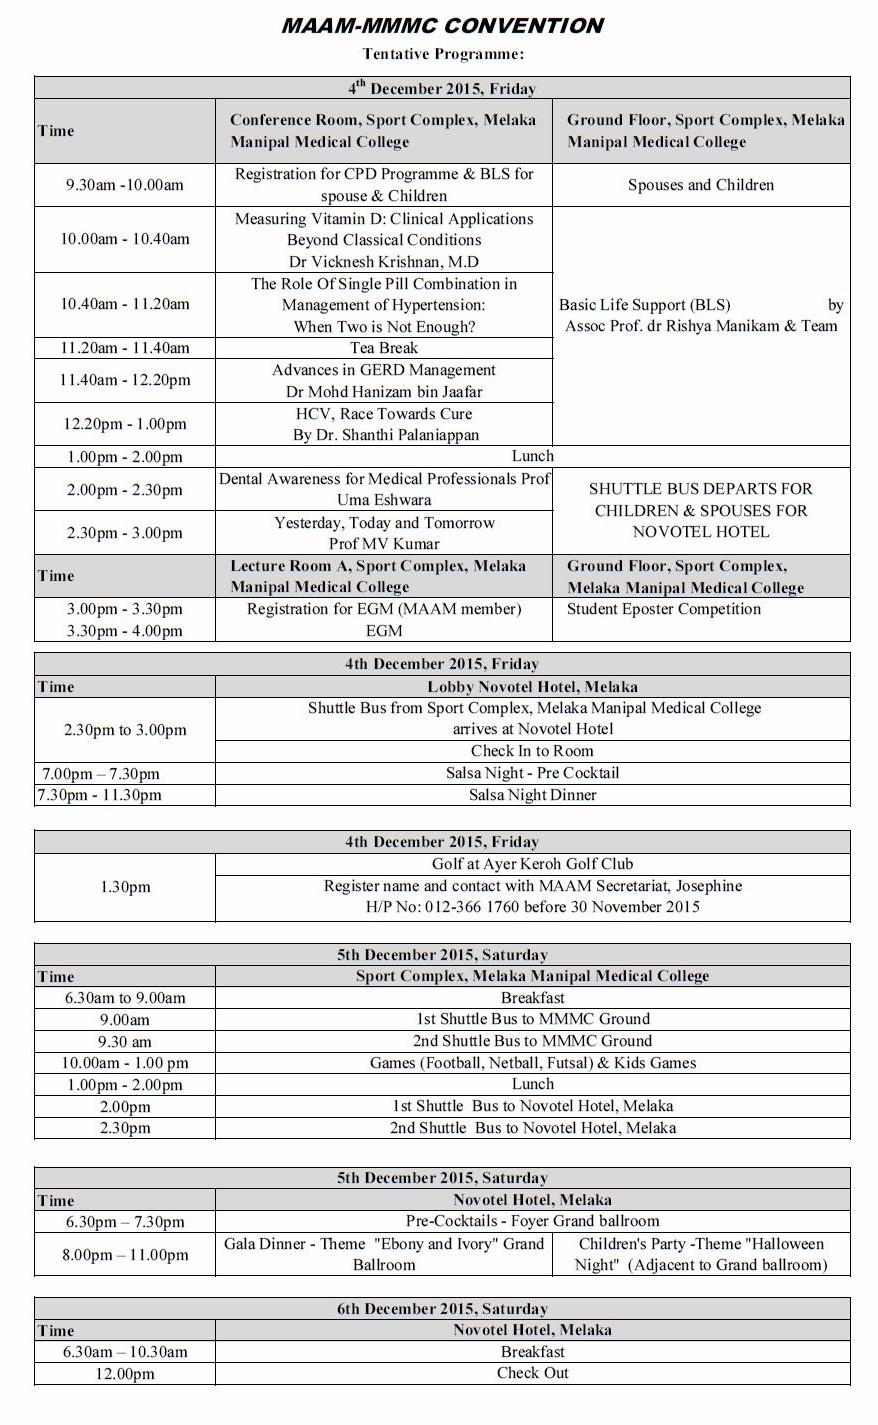 2015 Revised Itinerery